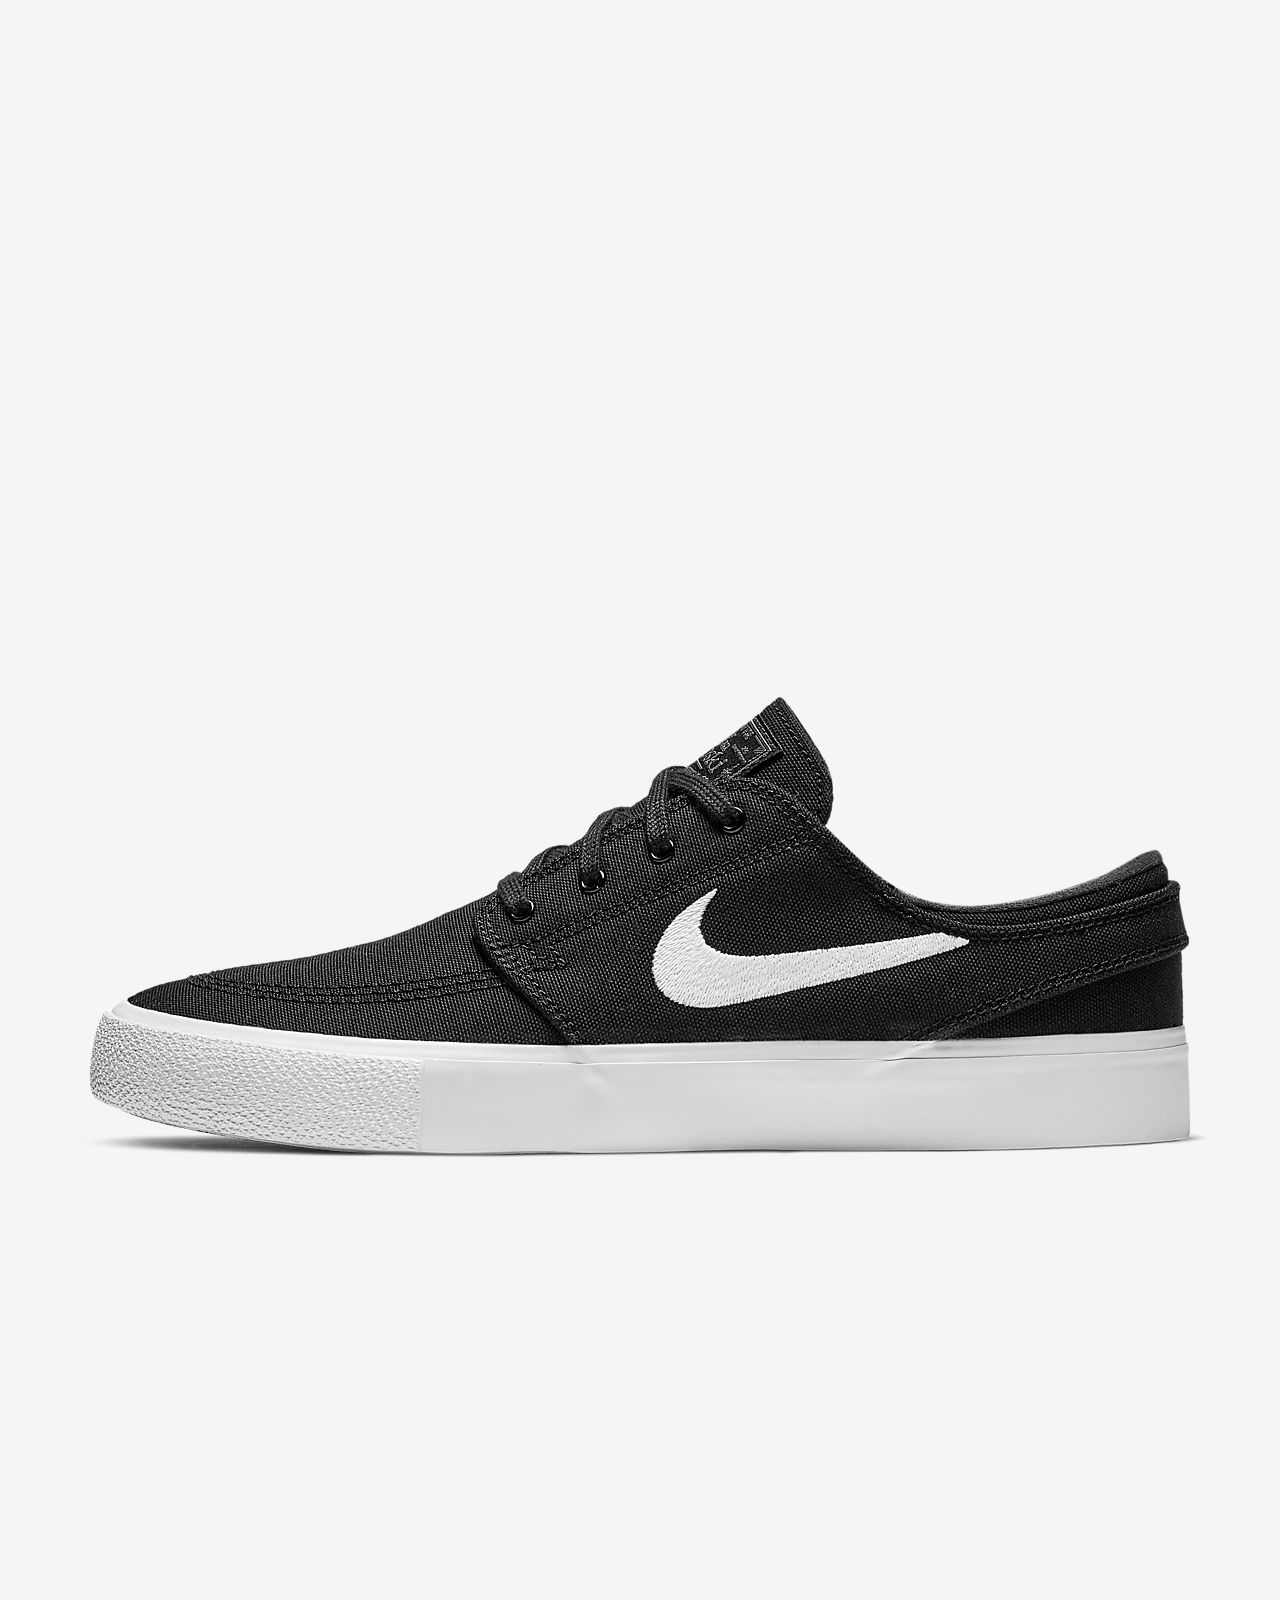 abf4d3425f9 Nike SB Zoom Stefan Janoski Canvas RM Skate Shoe